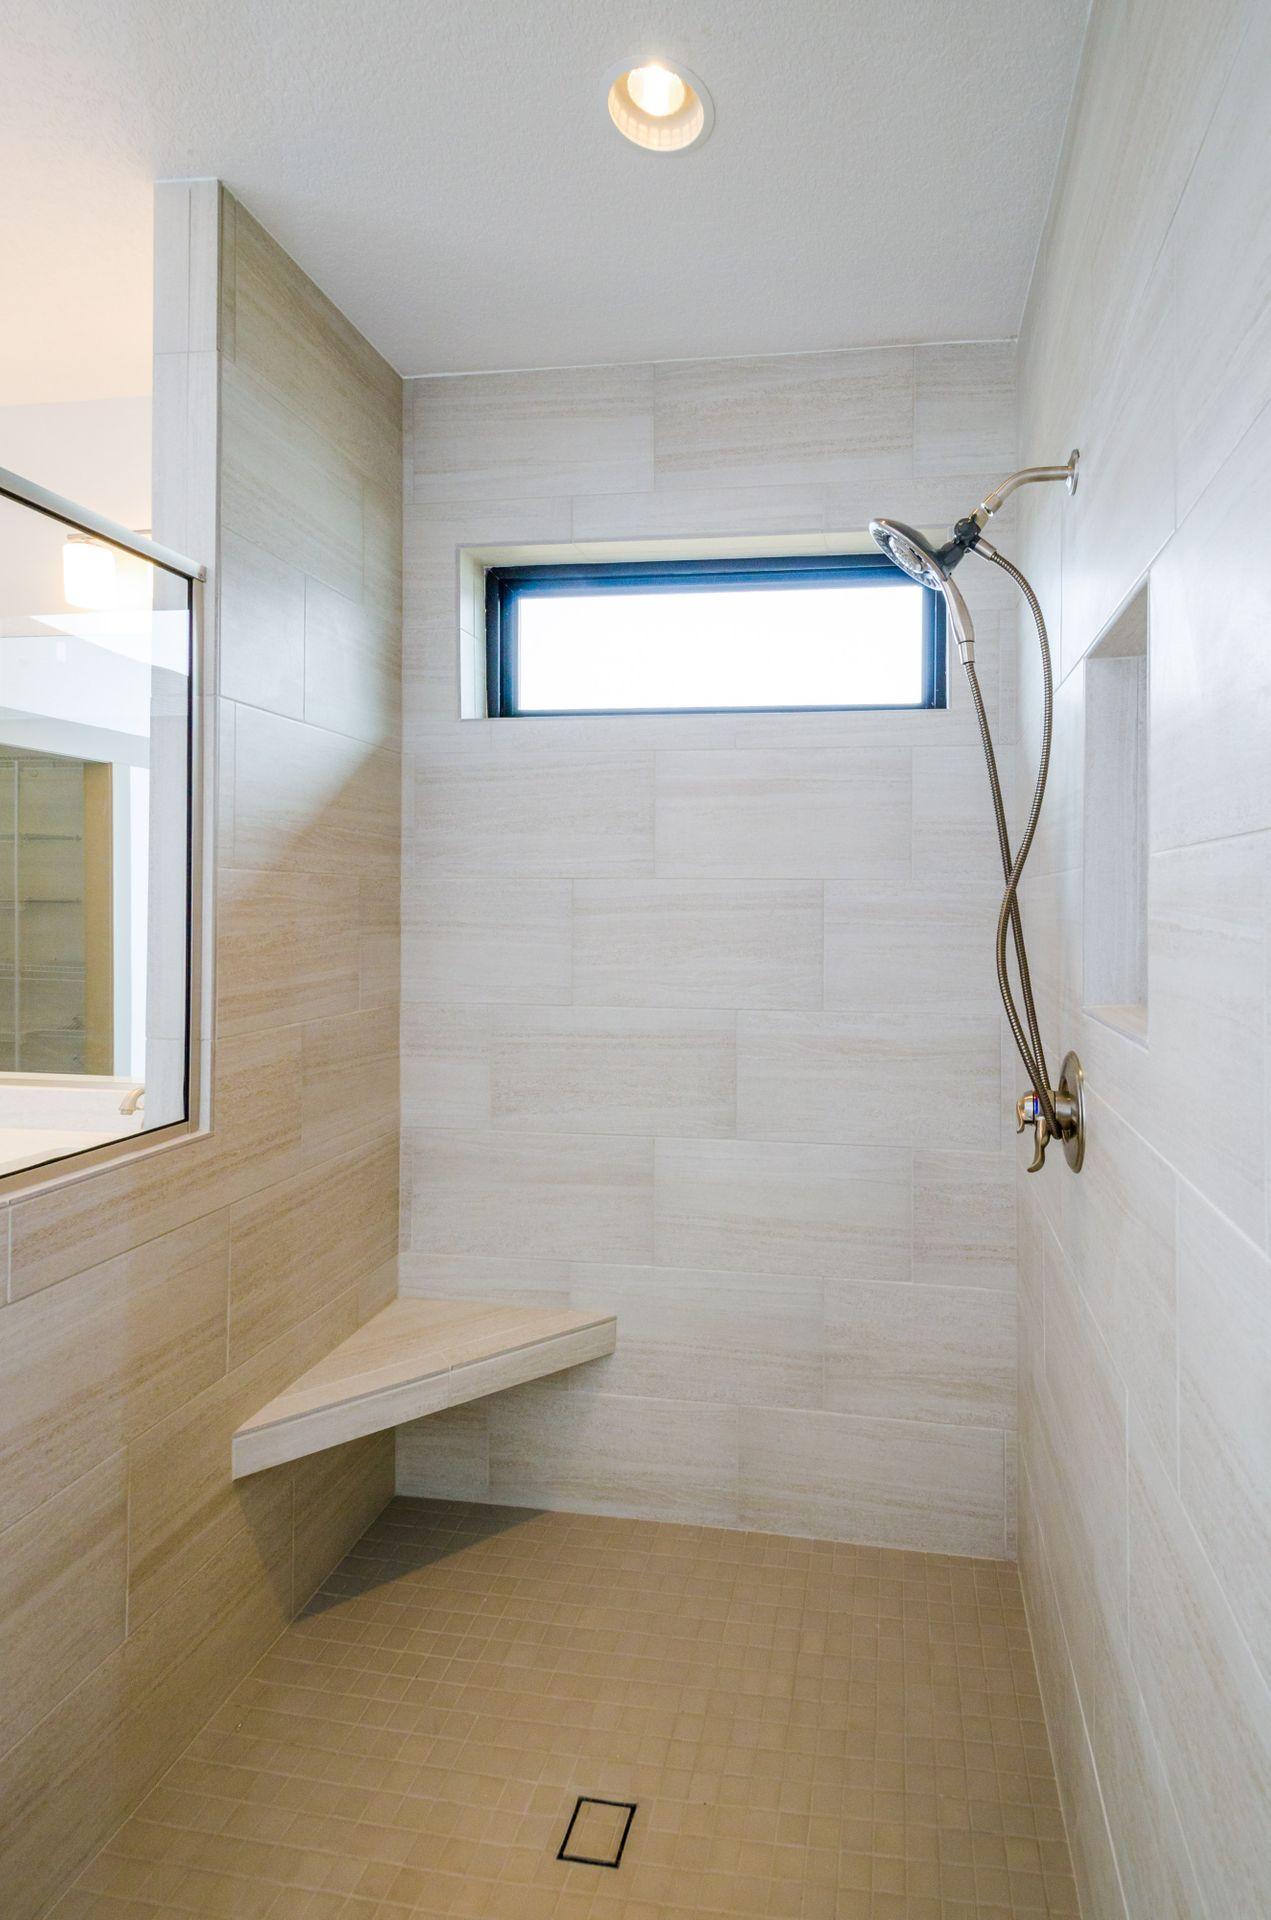 Next-Step-Homes_16885-madison-cir-clive-IA12.jpg